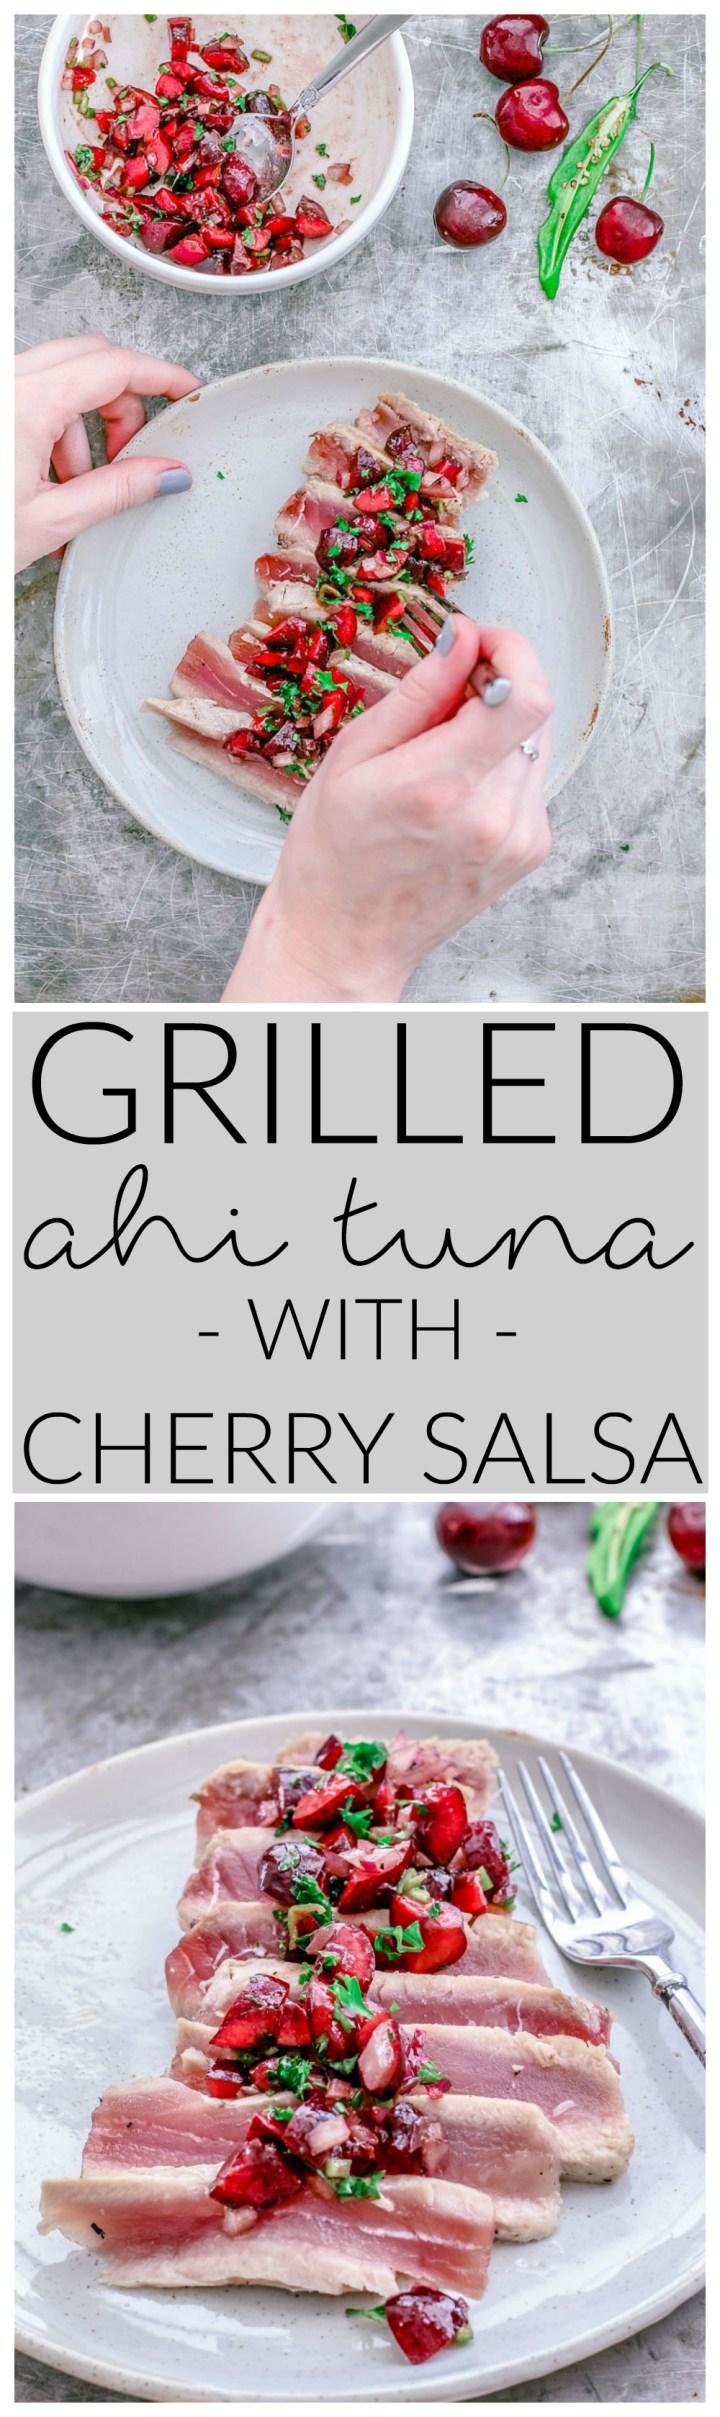 Grilled Ahi Tuna With Cherry Salsa   Killing Thyme